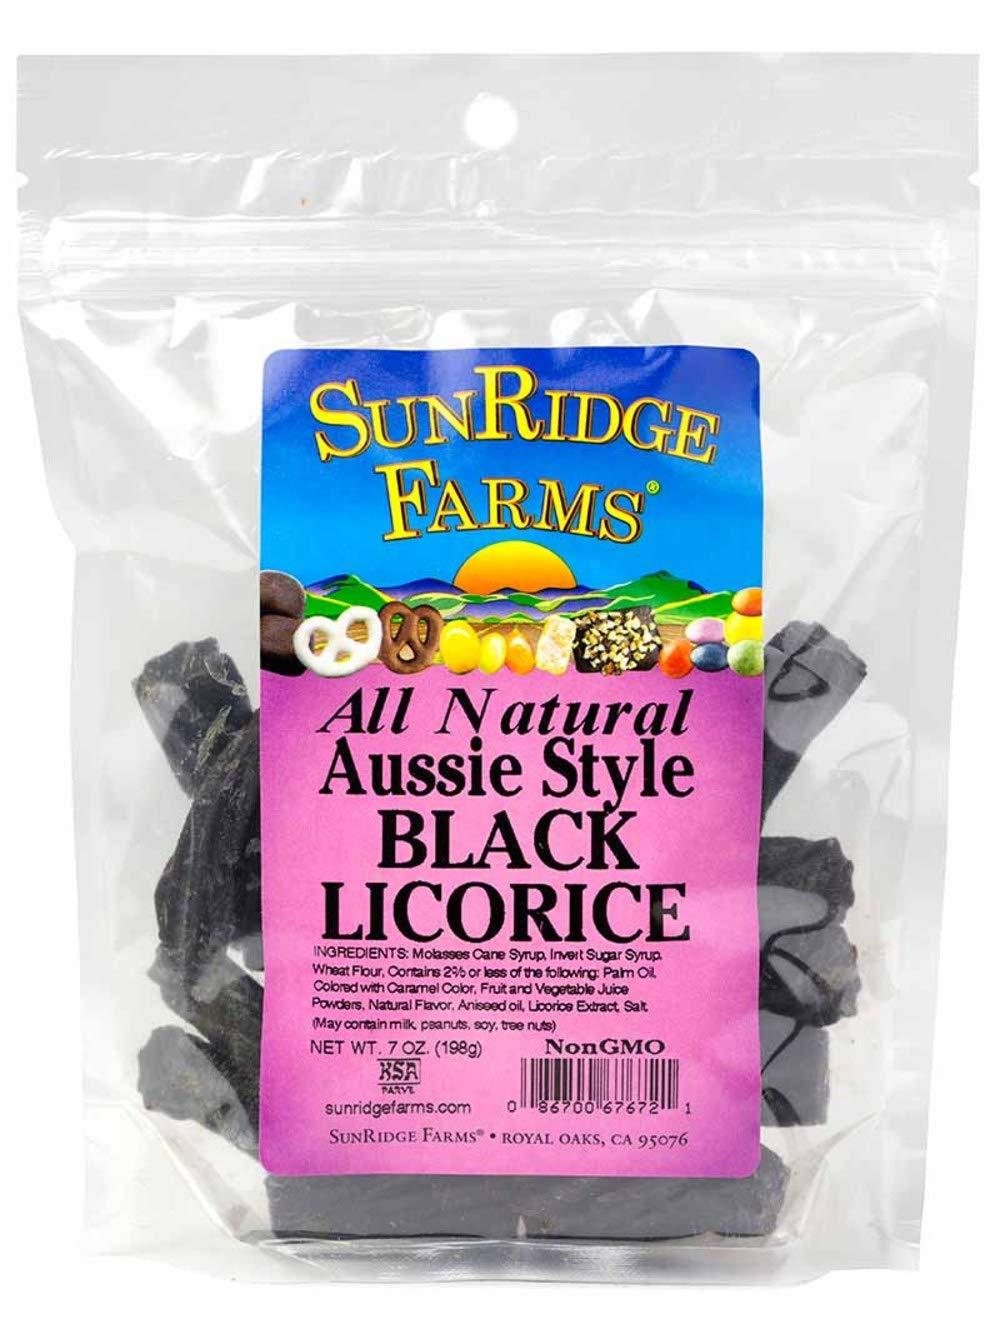 SunRidge Farms Aussie Style Black Licorice 7 Ounce Bag (Pack of 12)